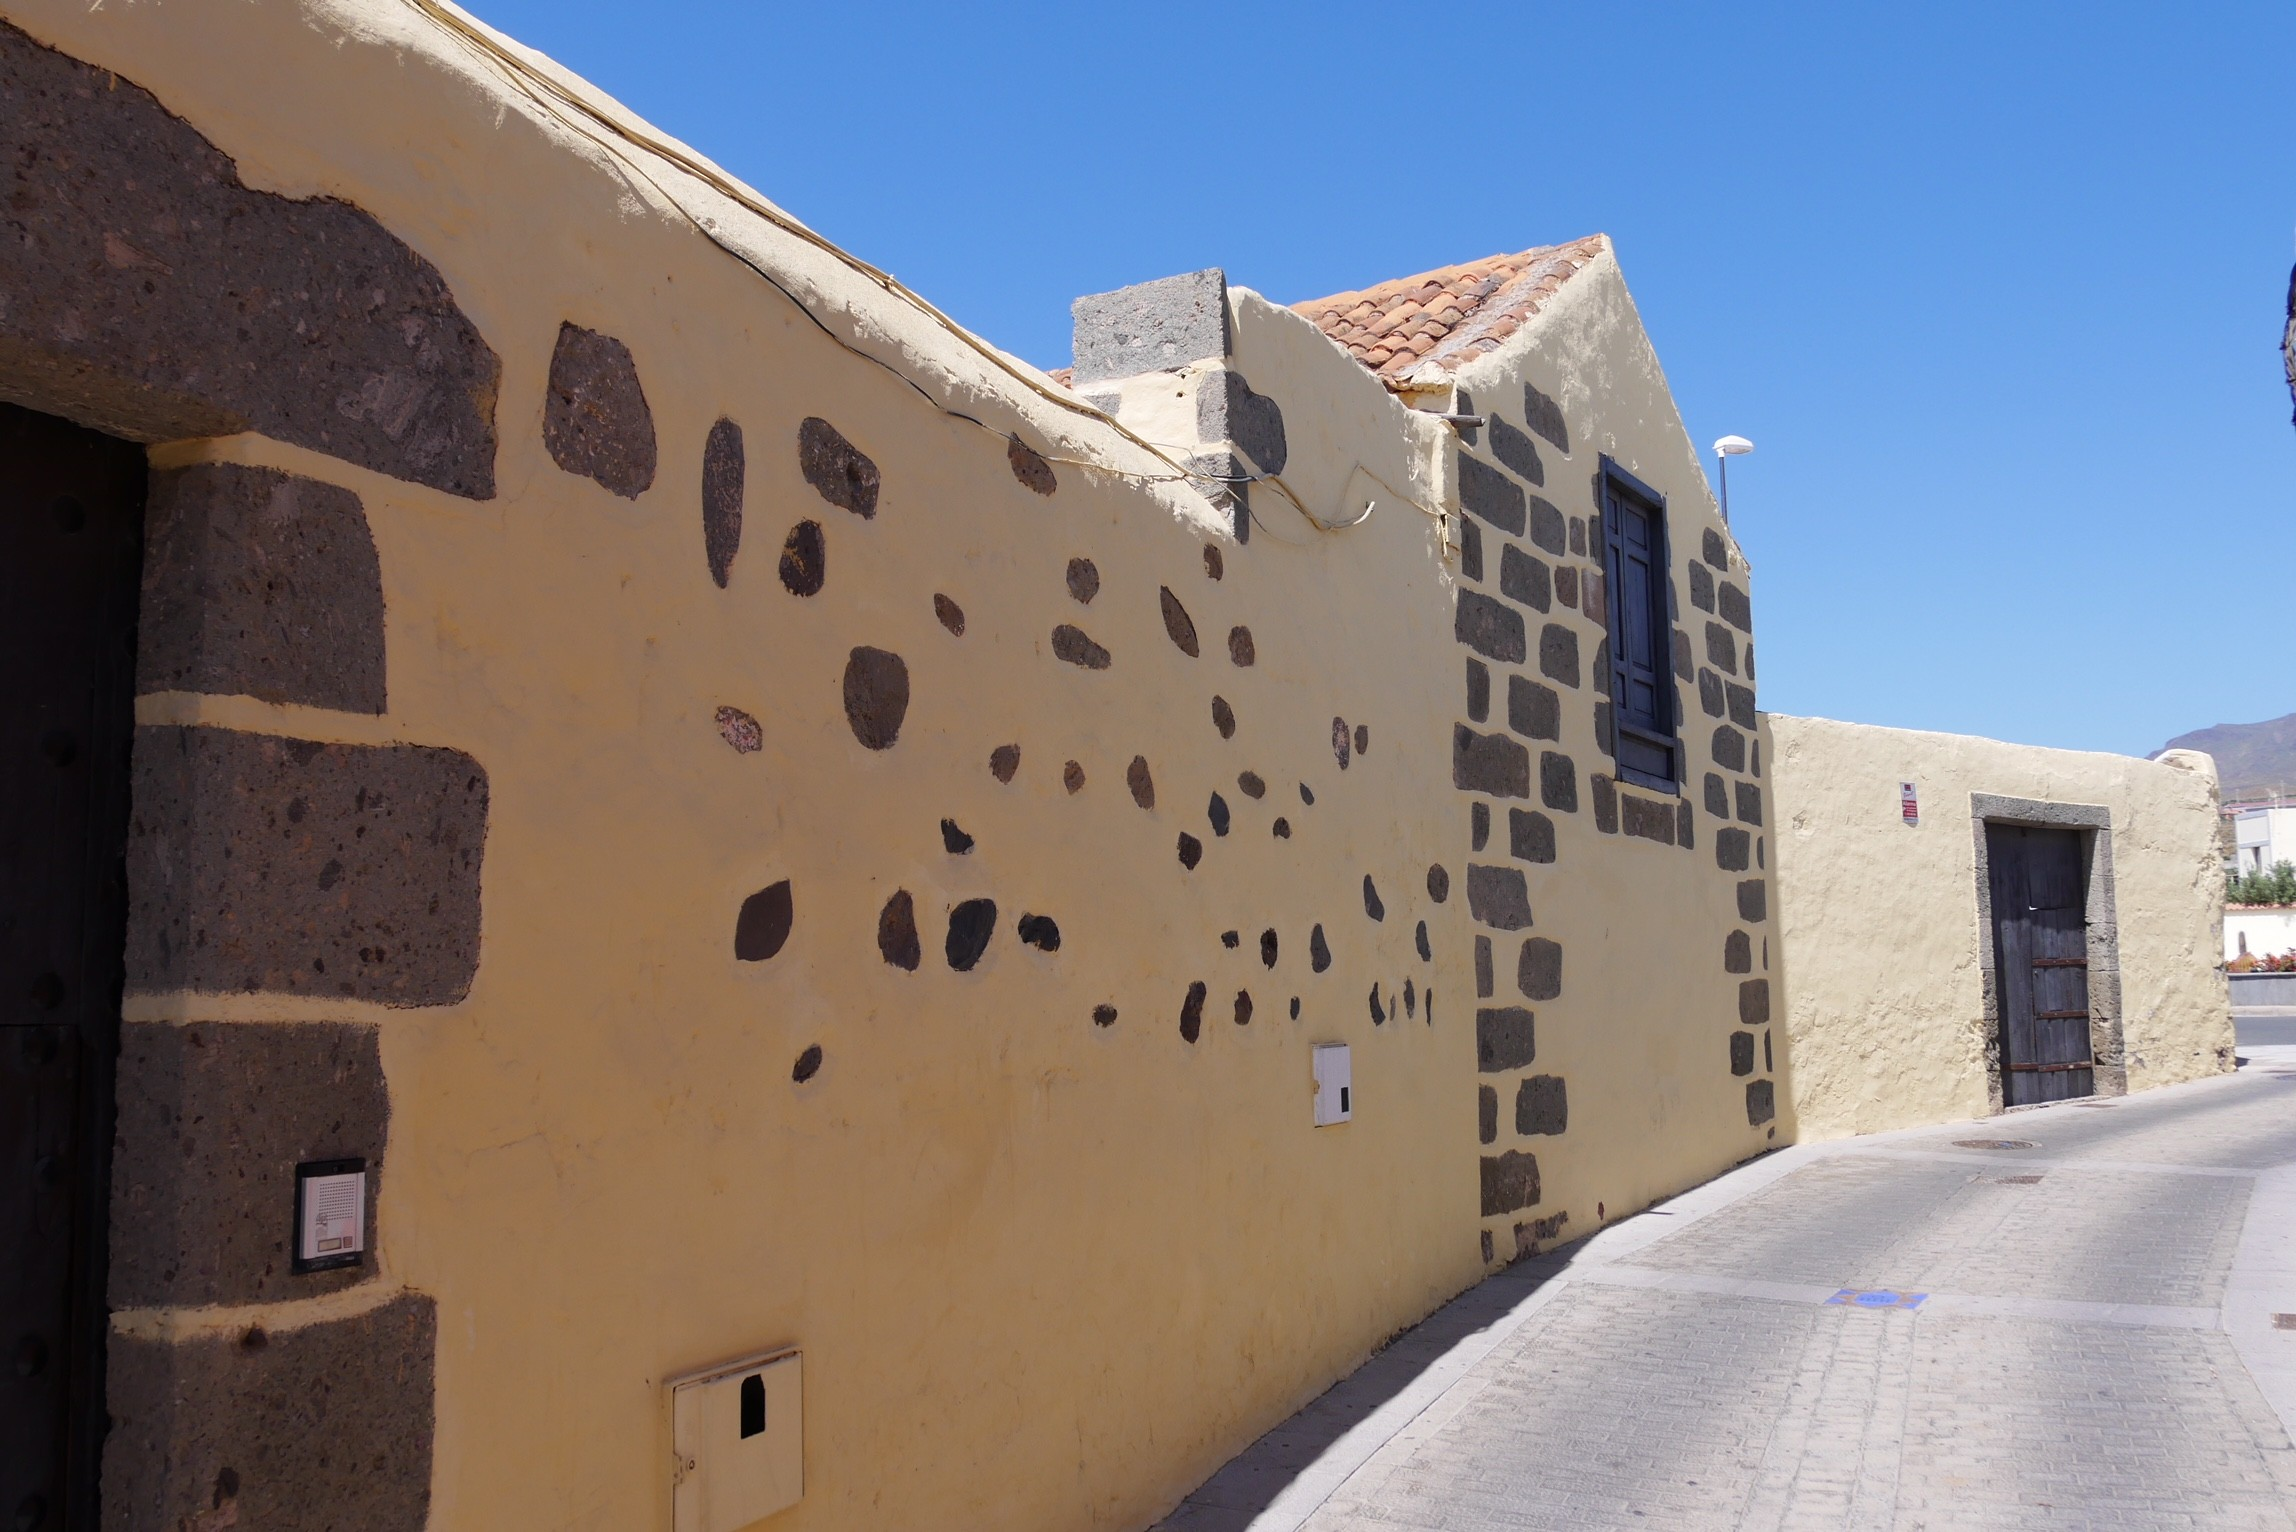 Gran Canaria, een route langs cultuur en natuur